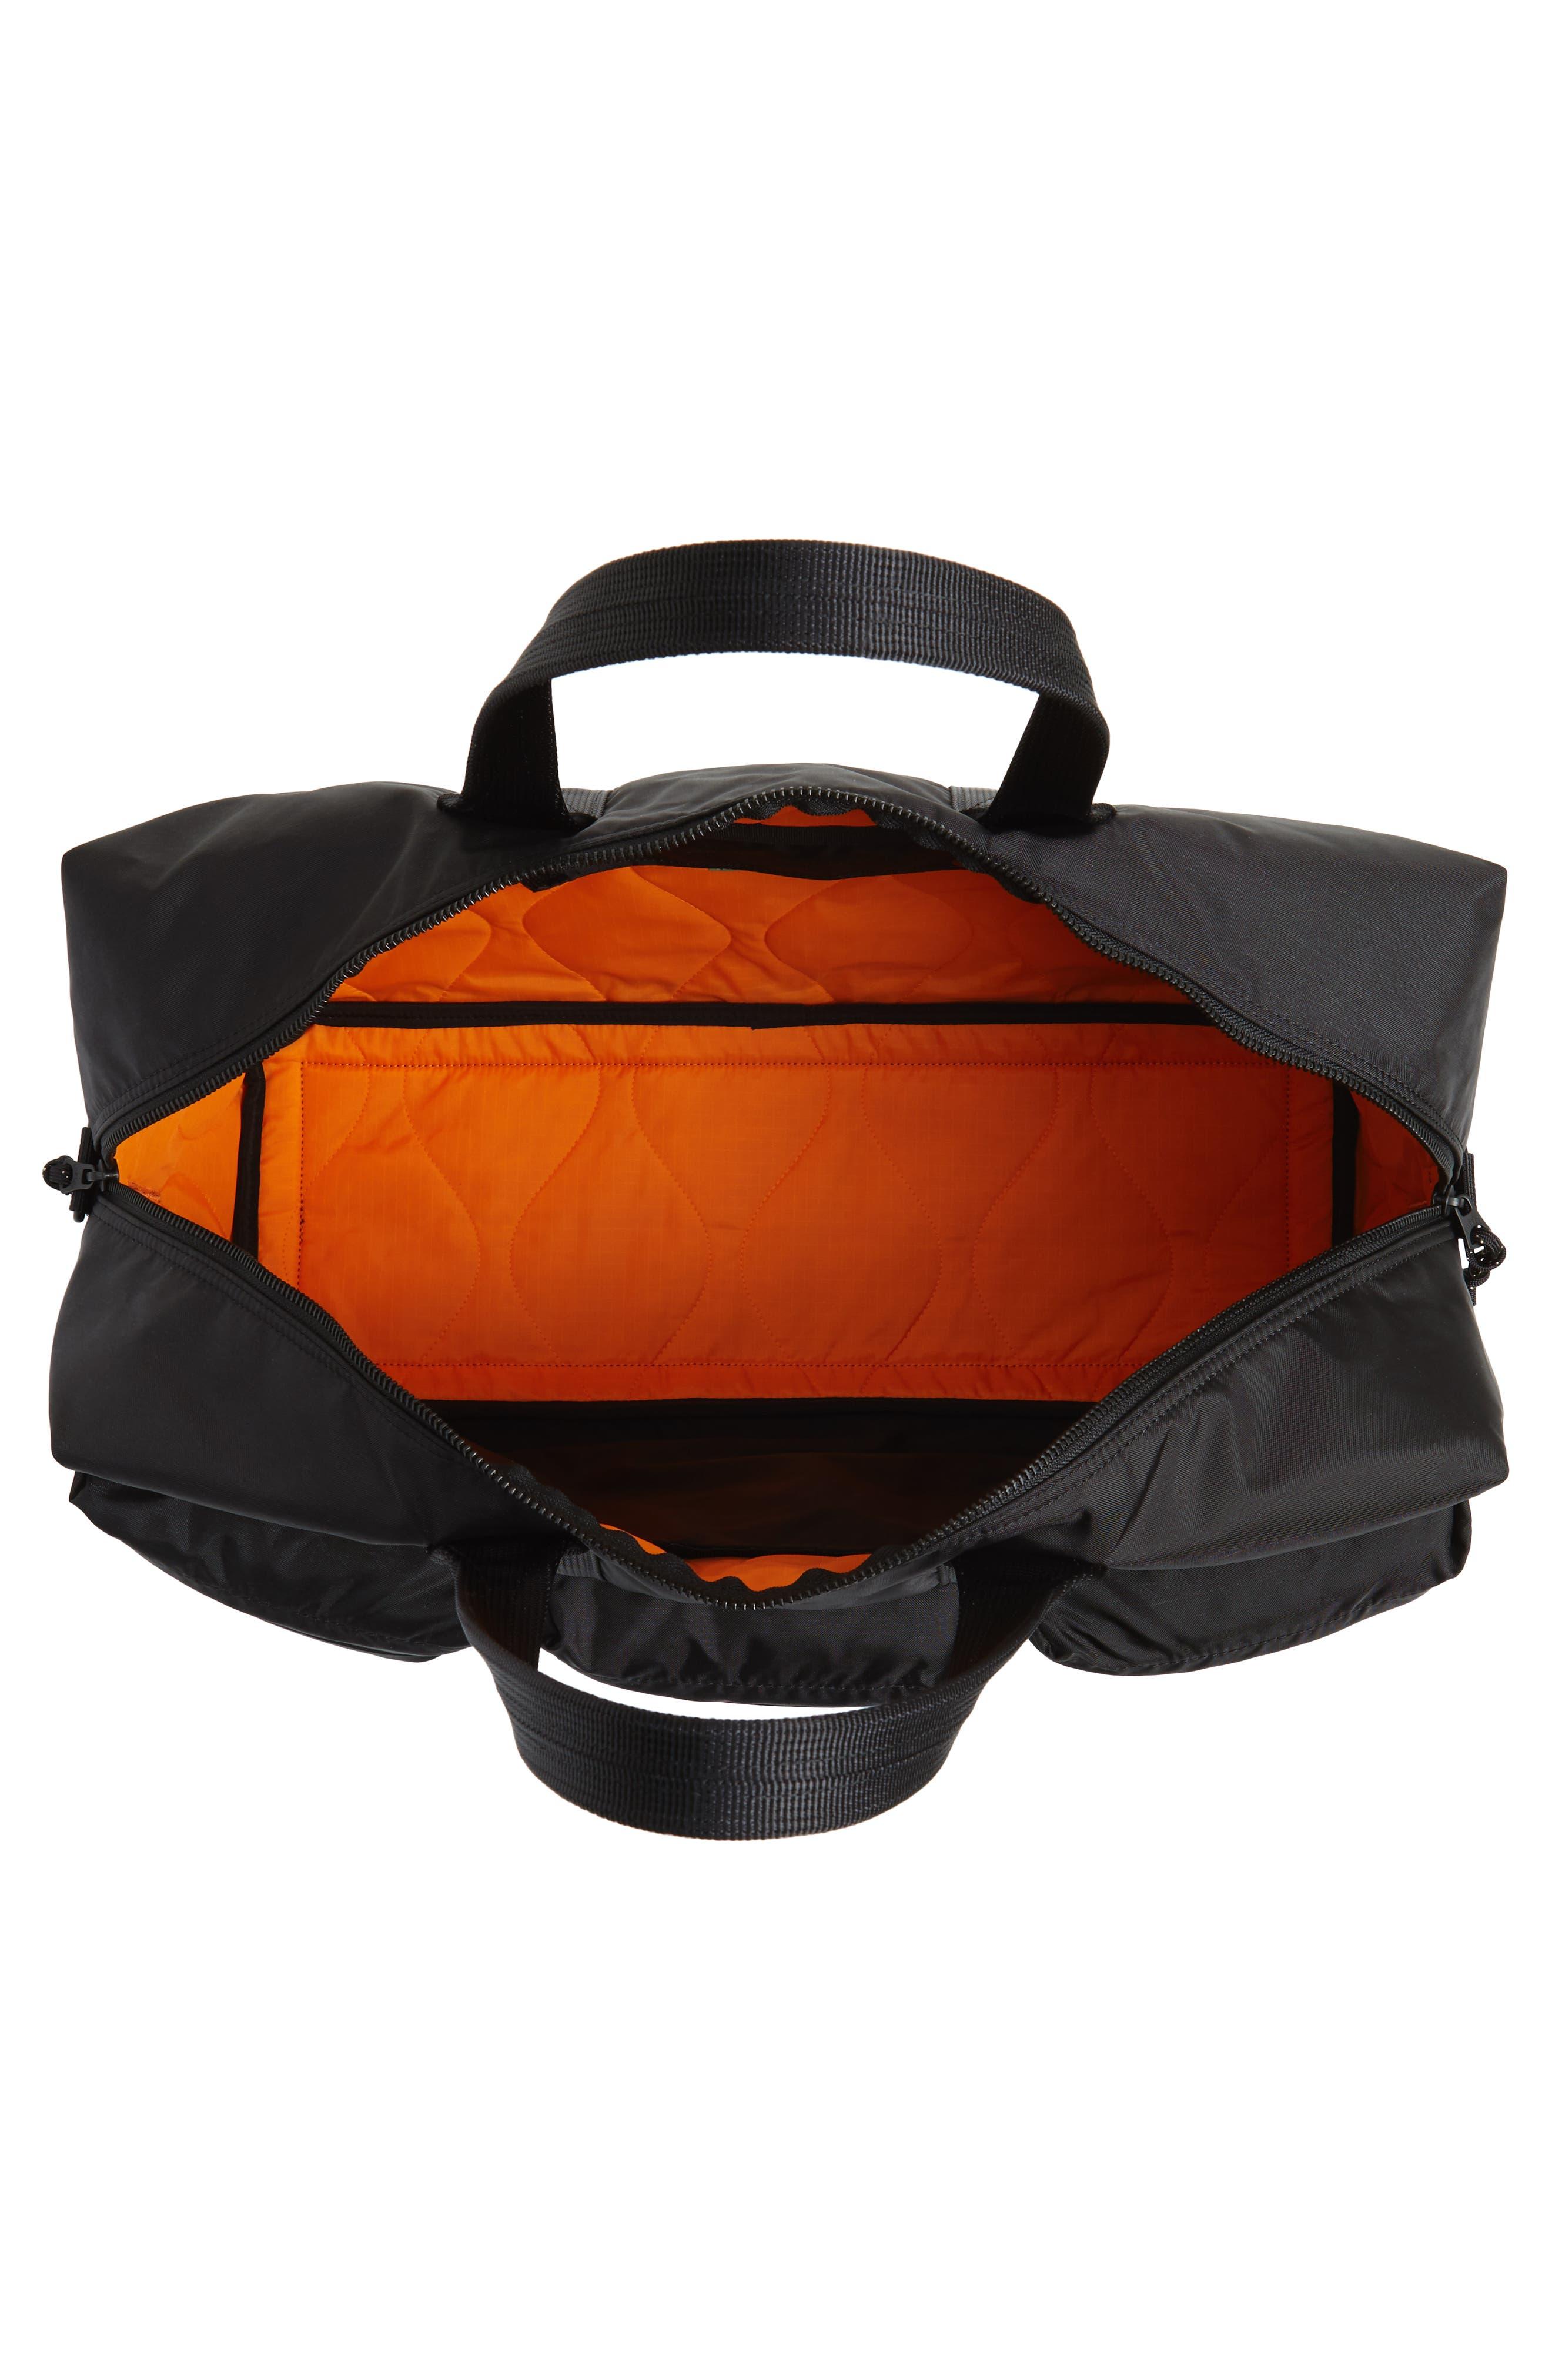 Porter-Yoshida & Co. Force Duffel Bag,                             Alternate thumbnail 4, color,                             Black